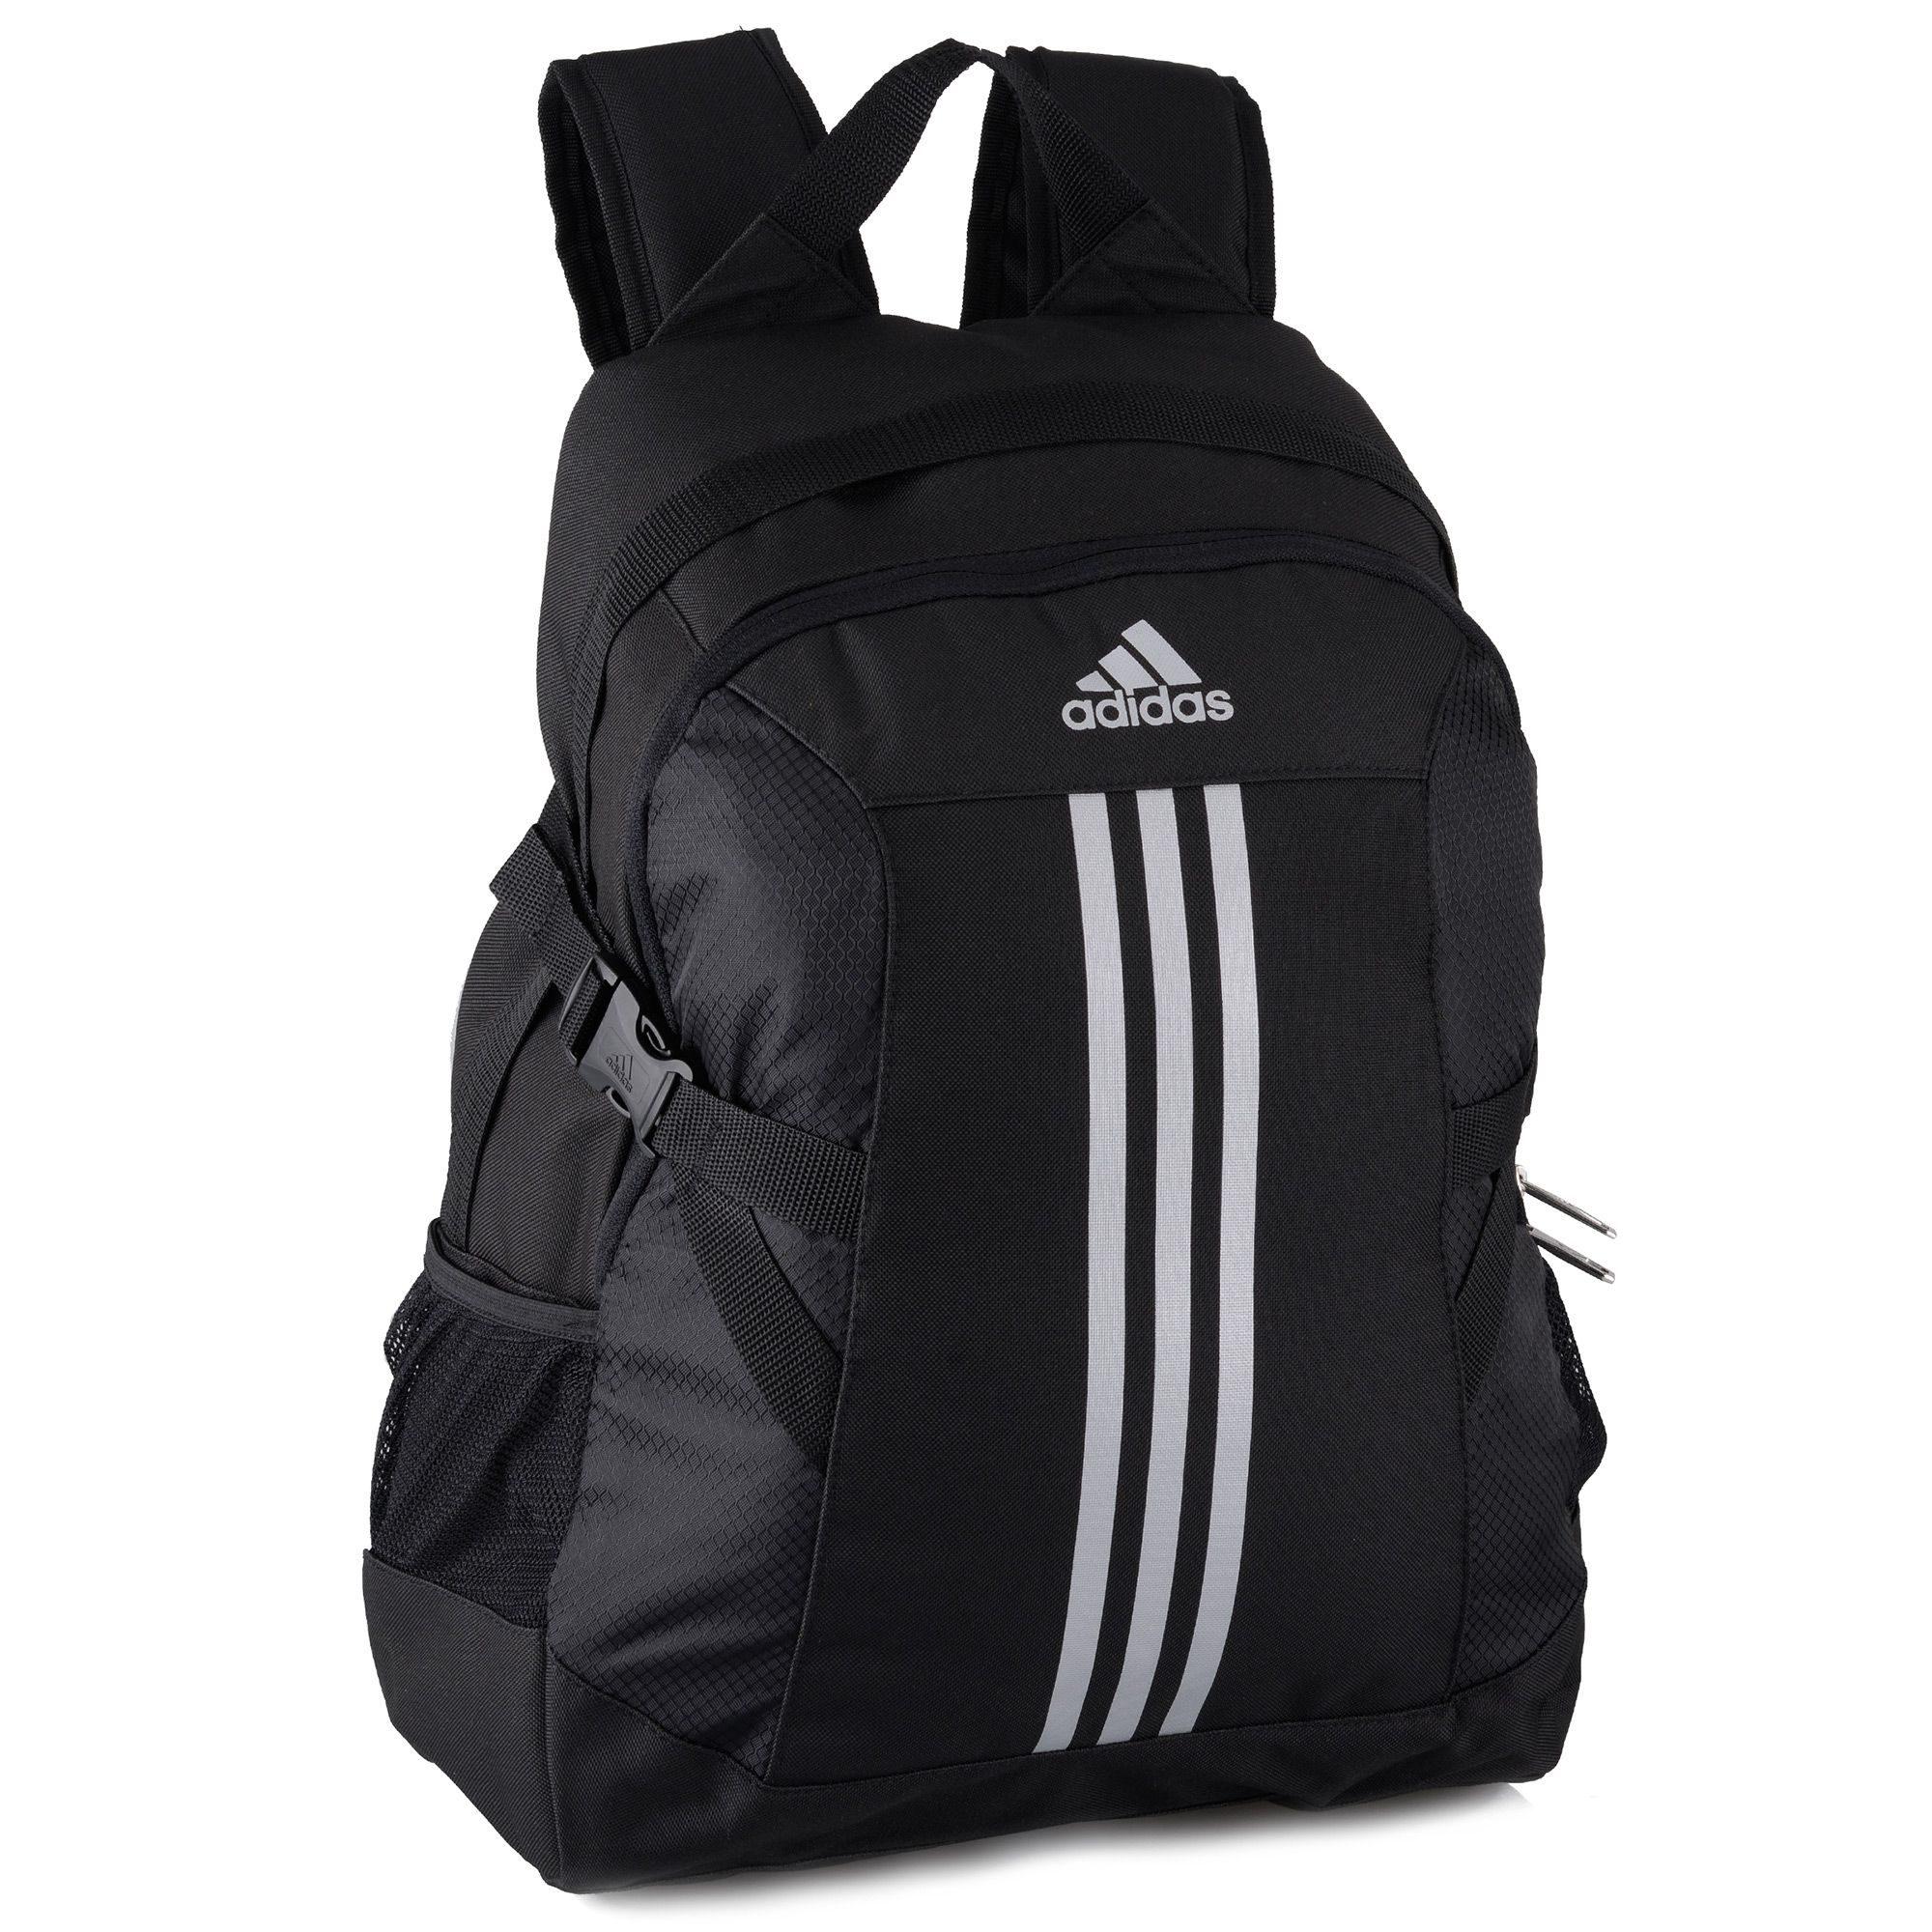 eb3eaec7441d adidas Backpack Power 2